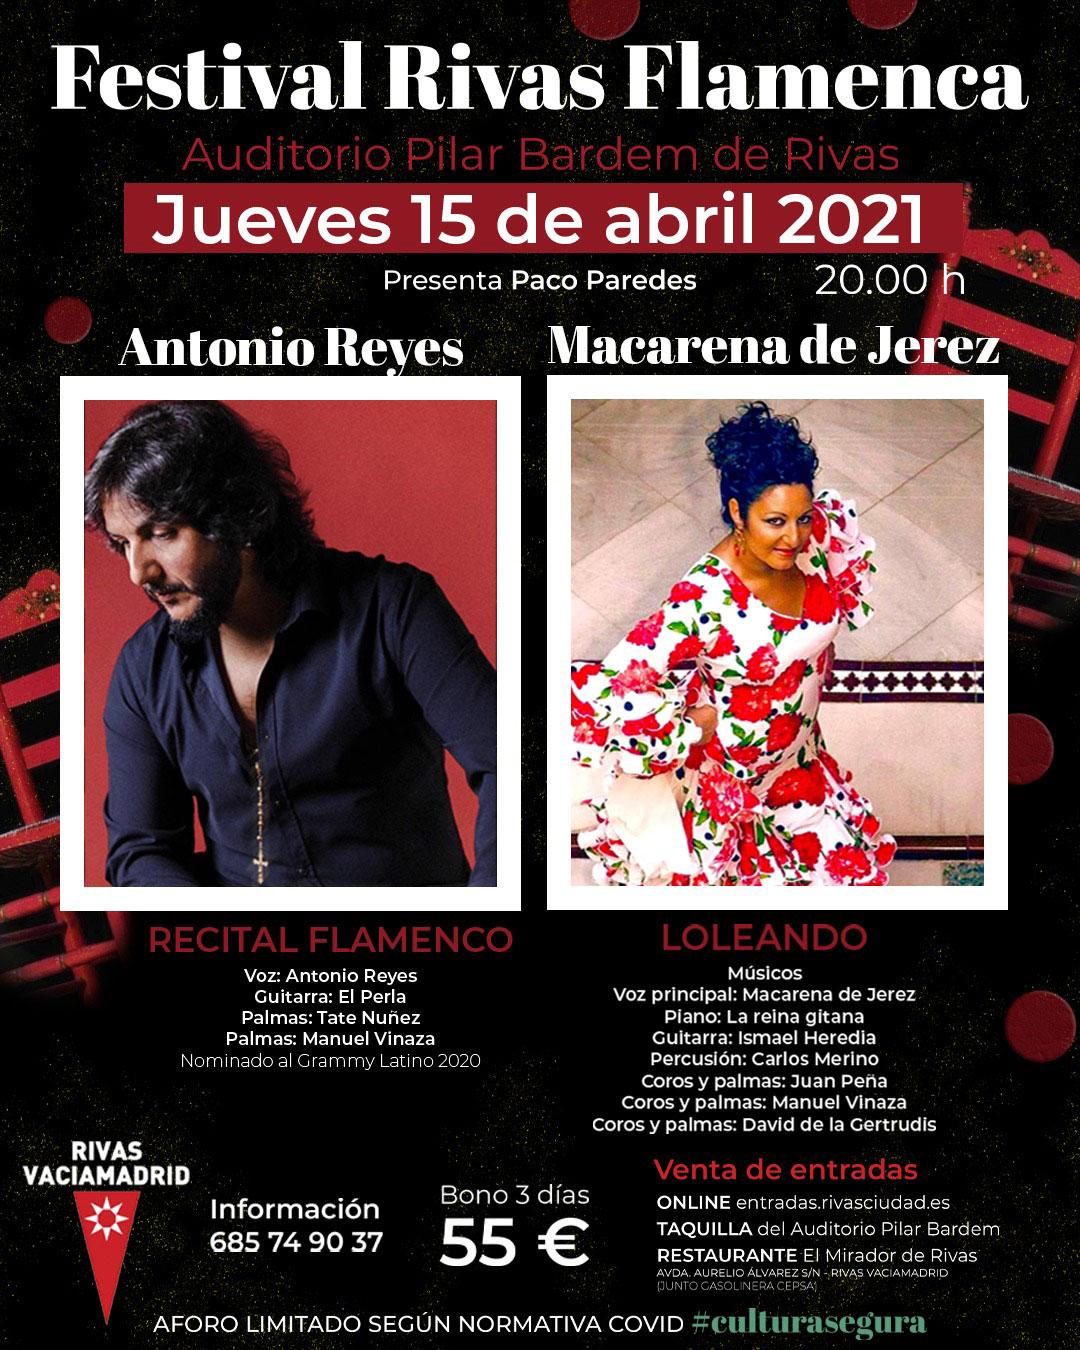 Rivas Flamenca 2021 - Antonio Reyes & Macarena de Jerez